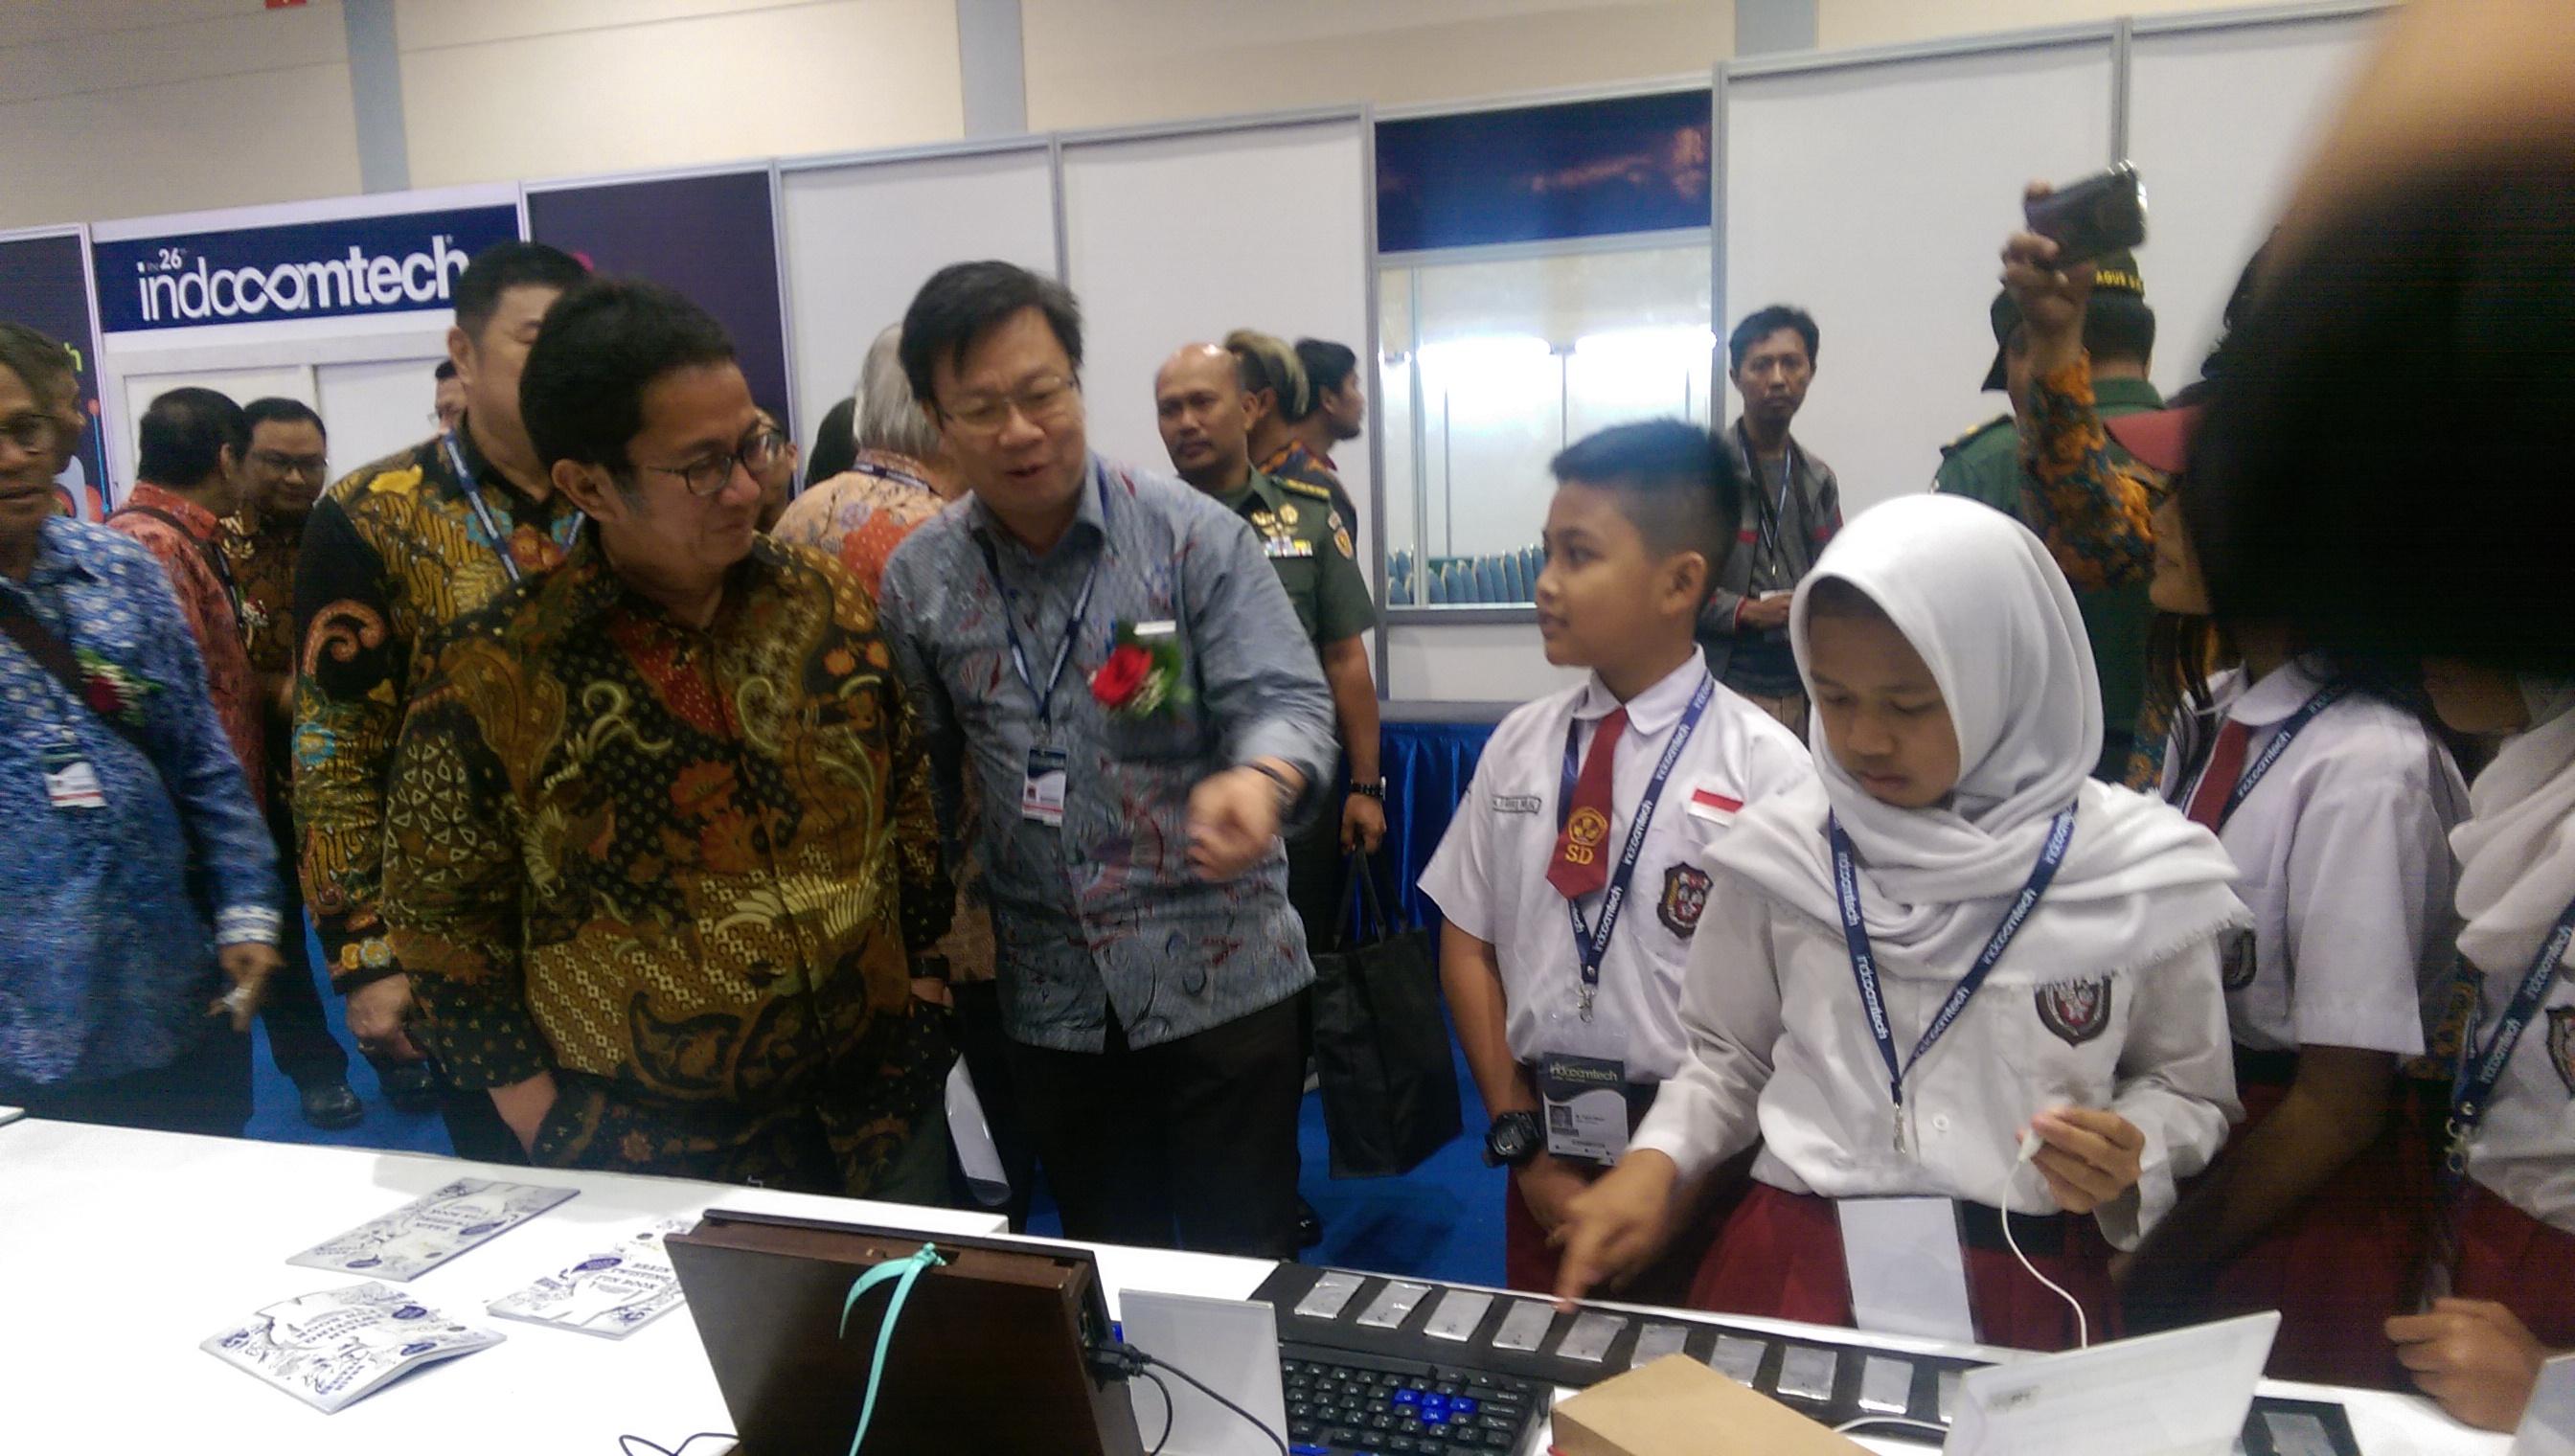 Indocomtech 2018 Pamerkan Hasil Karya Pelajar